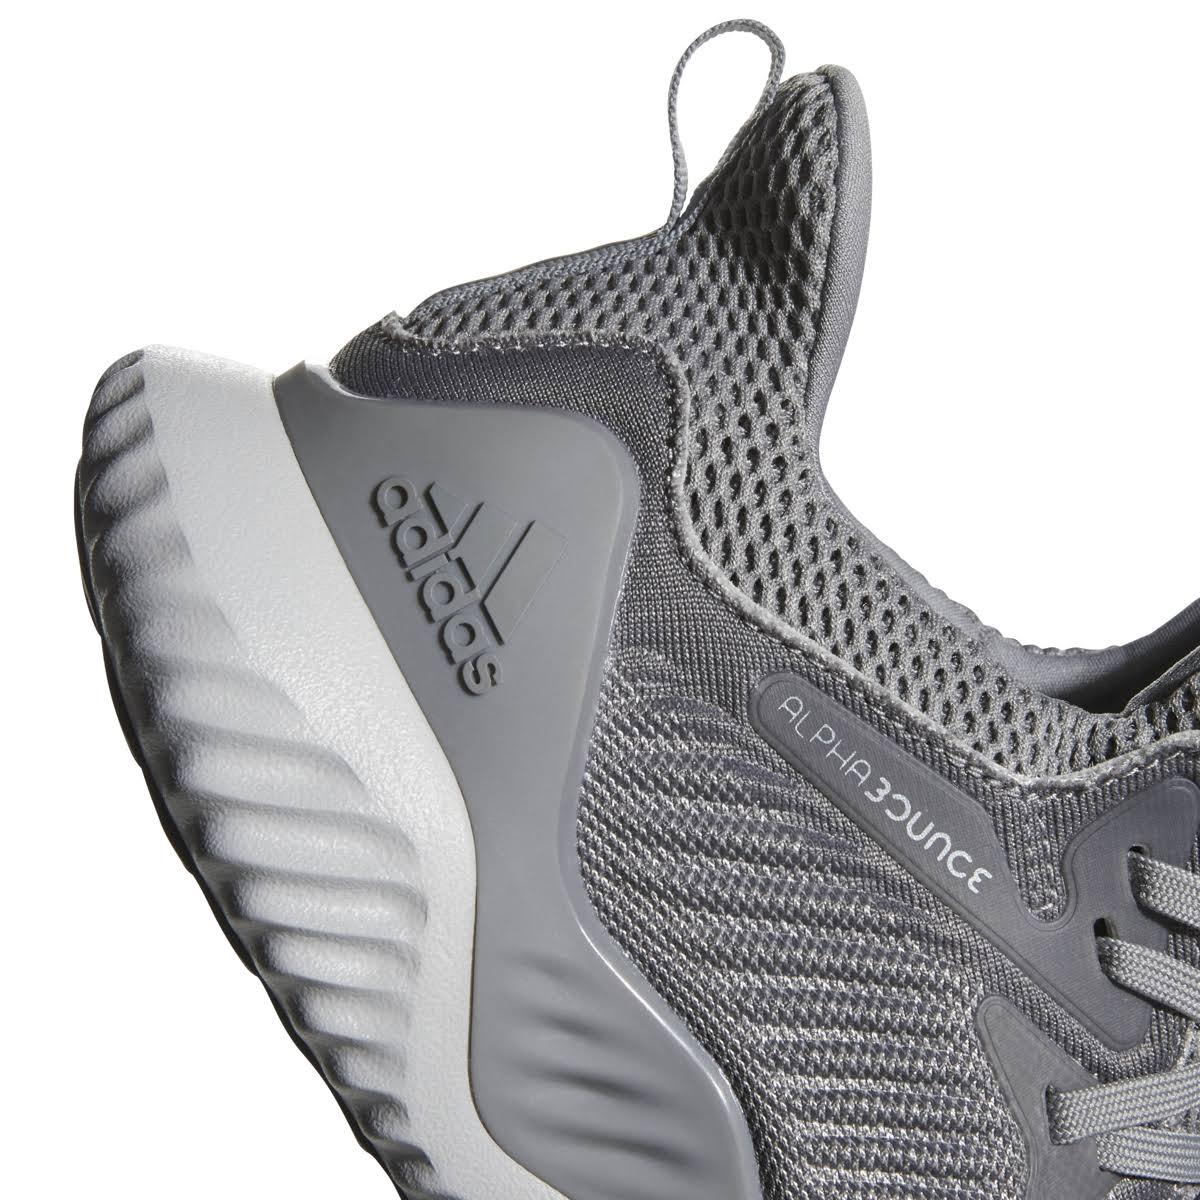 Beyond Grau 8 Trainers Womens Adidas Alphabounce RxYwqgEqZ